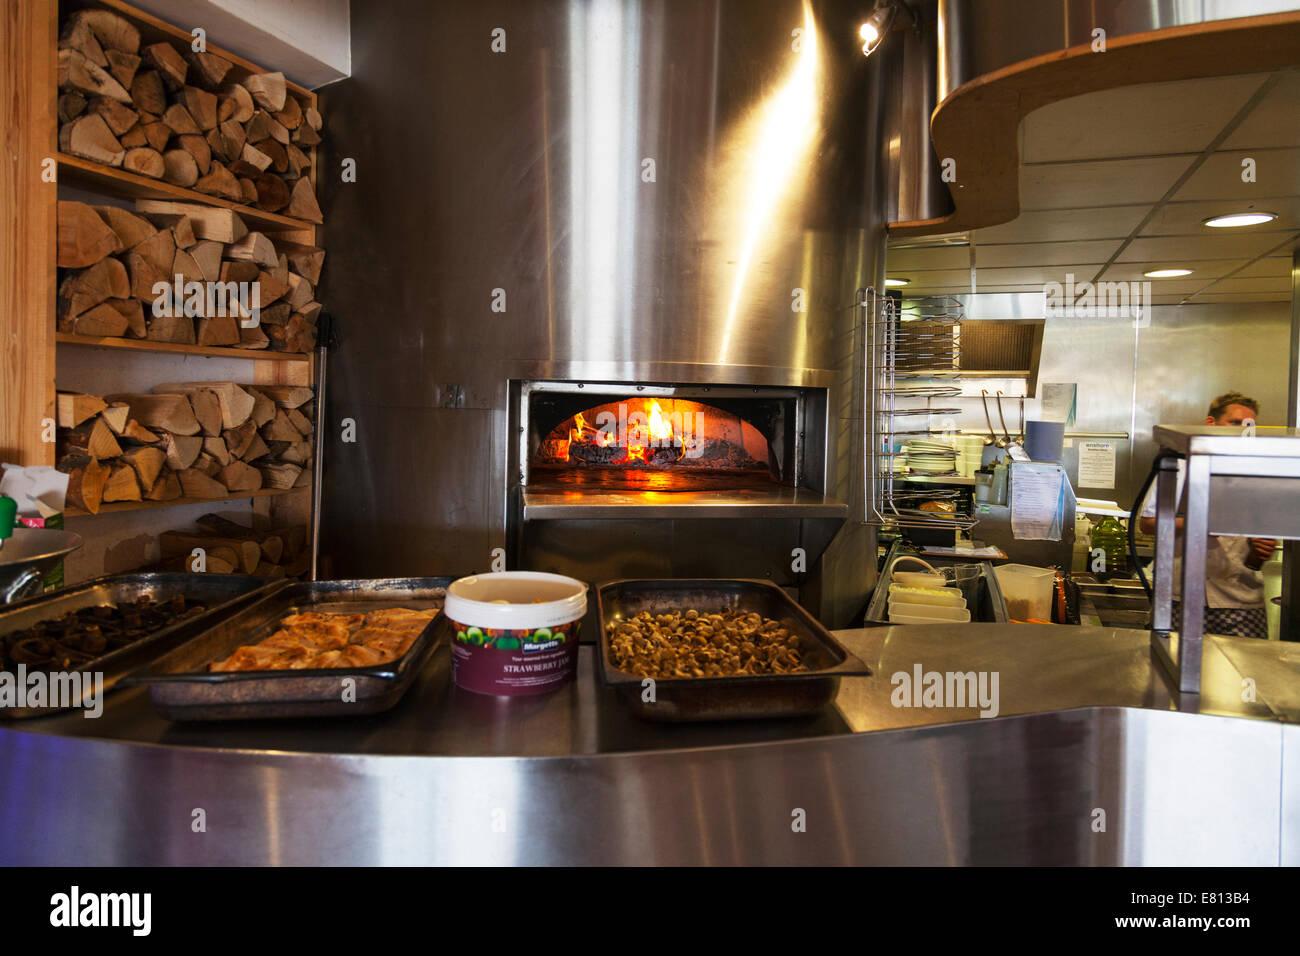 Restaurant Kitchen Oven pizza oven chrome huge flame cooker kitchen restaurant cooking